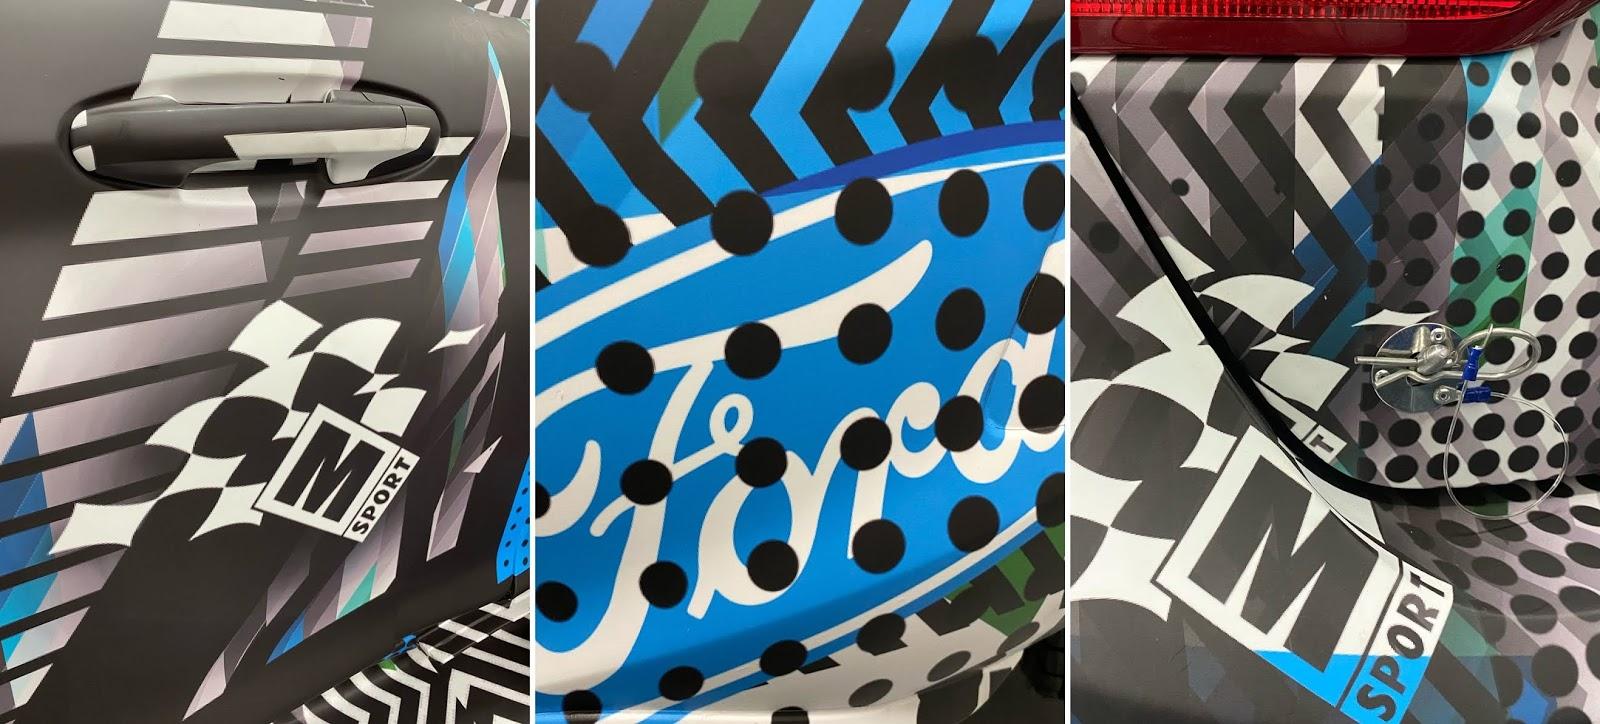 WRC Teaser Ford : Δηλώνει τη δέσμευσή της στη νέα, υβριδική εποχή του WRC (& video) Fiesta WRC, Ford, Ford Performance, WRC, αγωνες, ειδήσεις